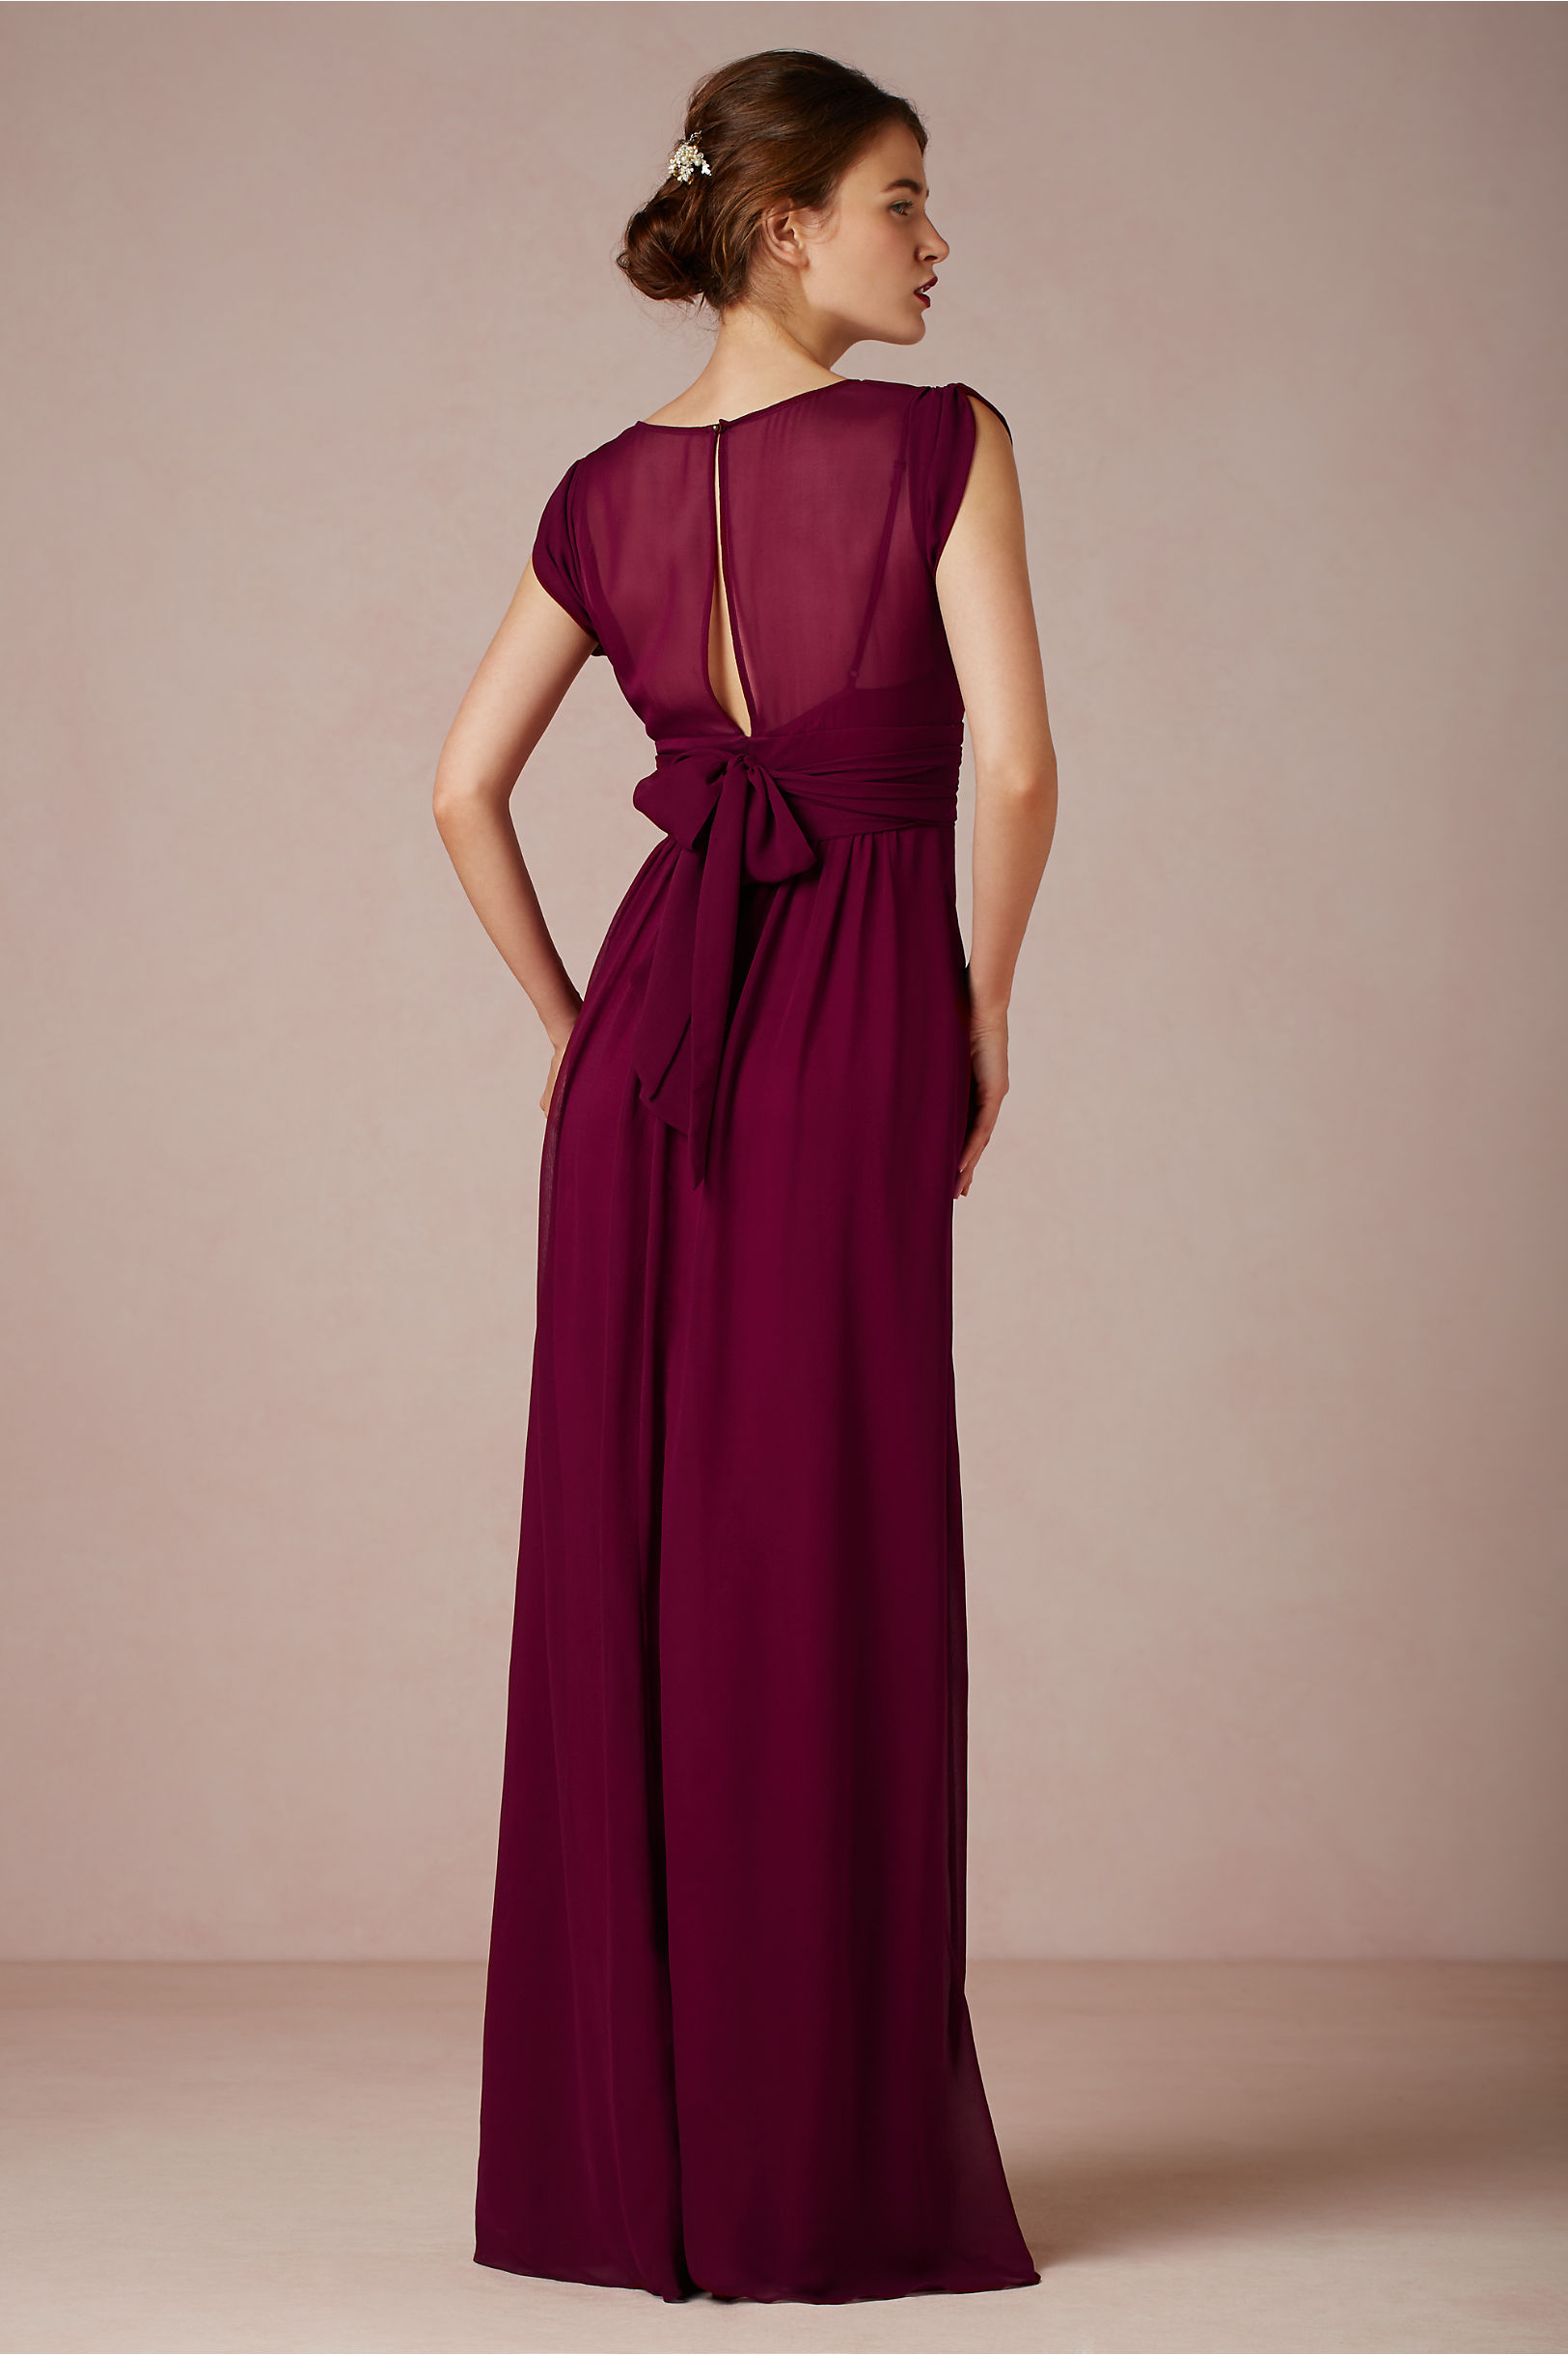 Ava Maxi Dress in Sale - BHLDN